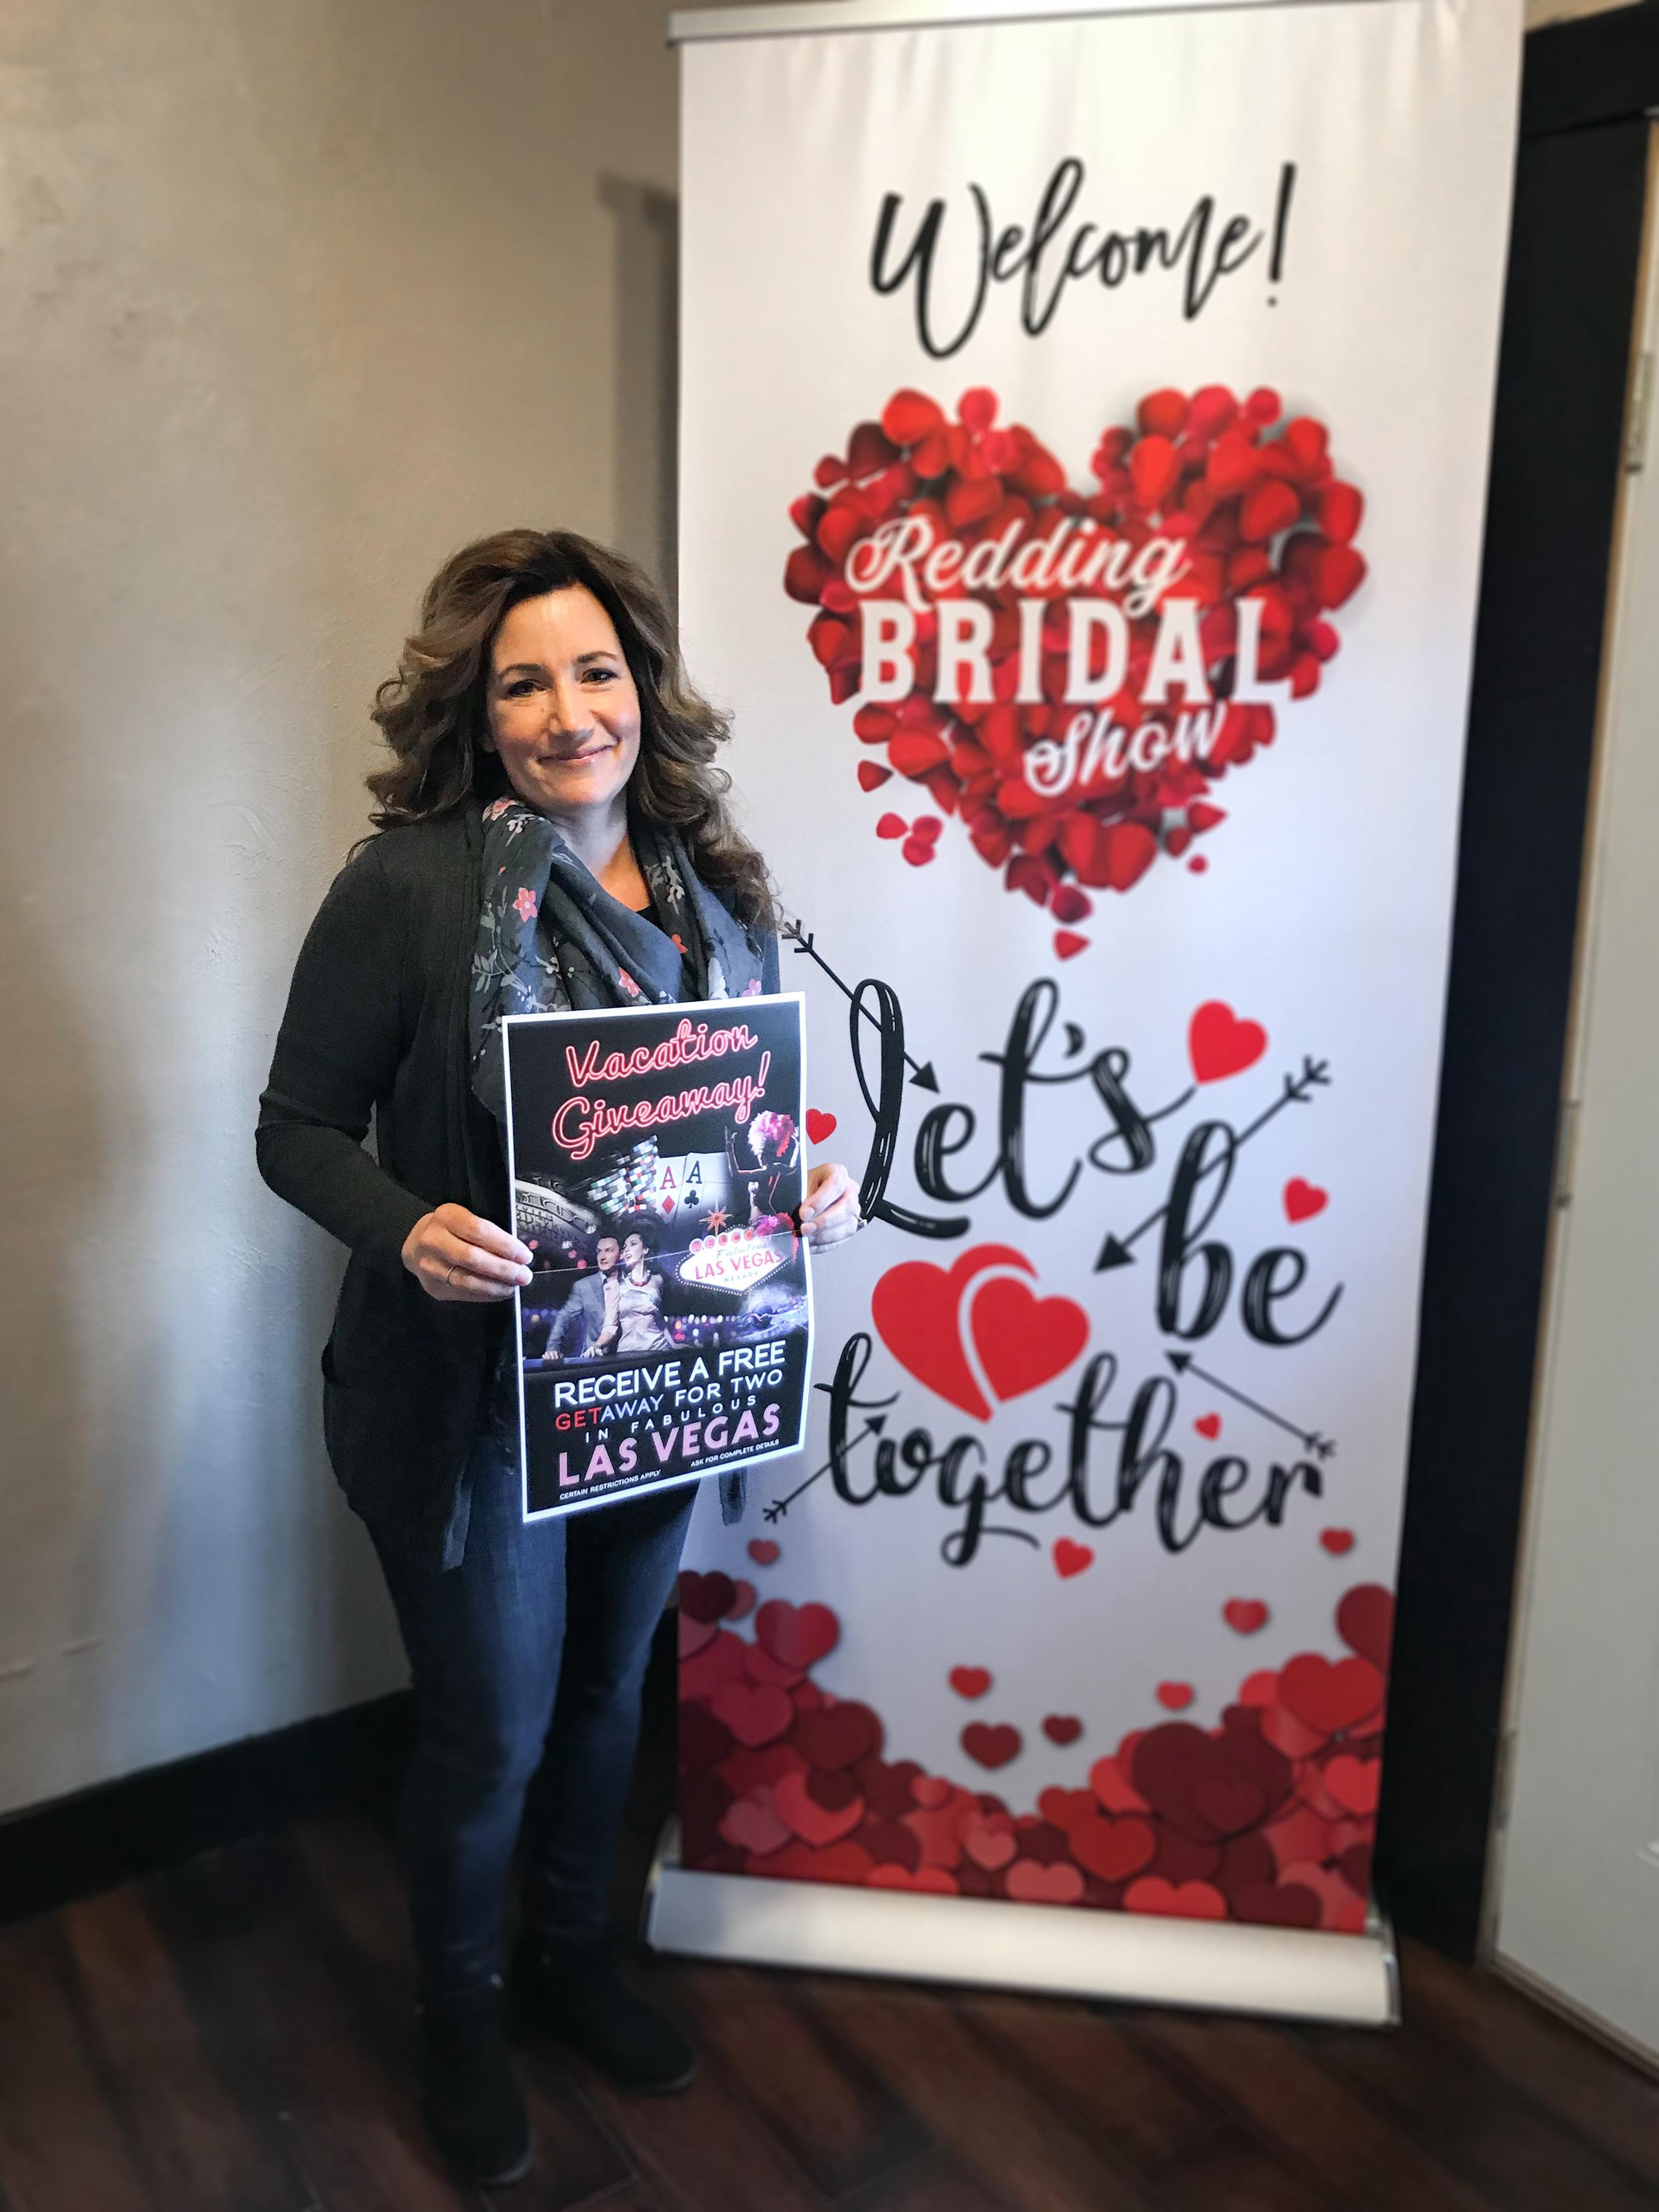 Las Vegas Trip Prize Winner Redding Bridal Show